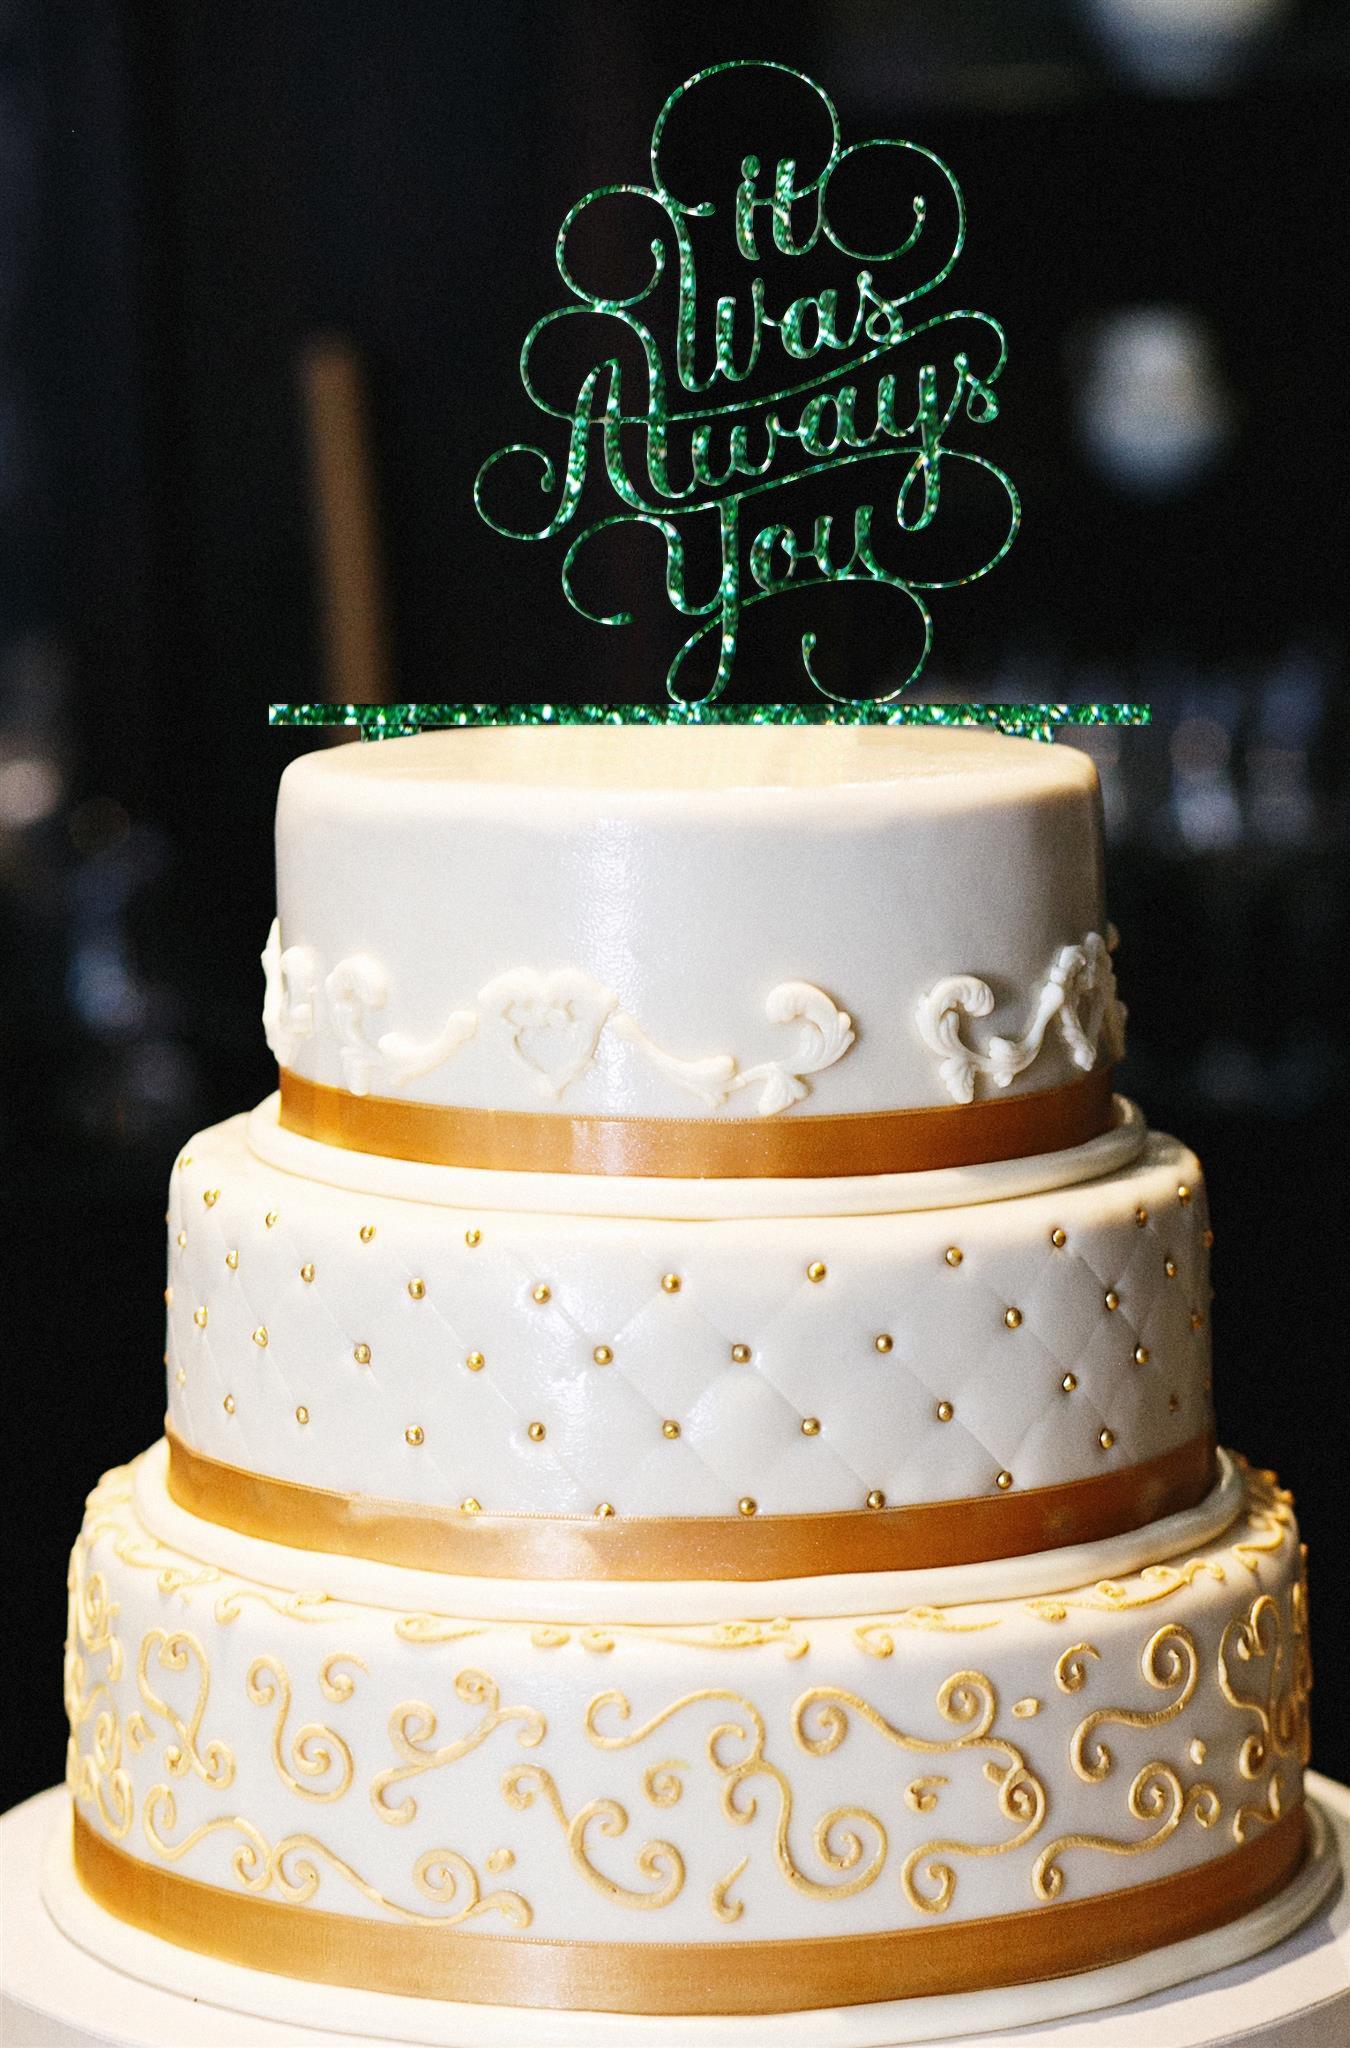 It Was Always You Wedding Cake Topper, Glitter Wedding Cake Topper, Engagement Cake Topper, Gold Cake Topper, Gold Glitter Cake Topper (15'', Glitter Emerald)